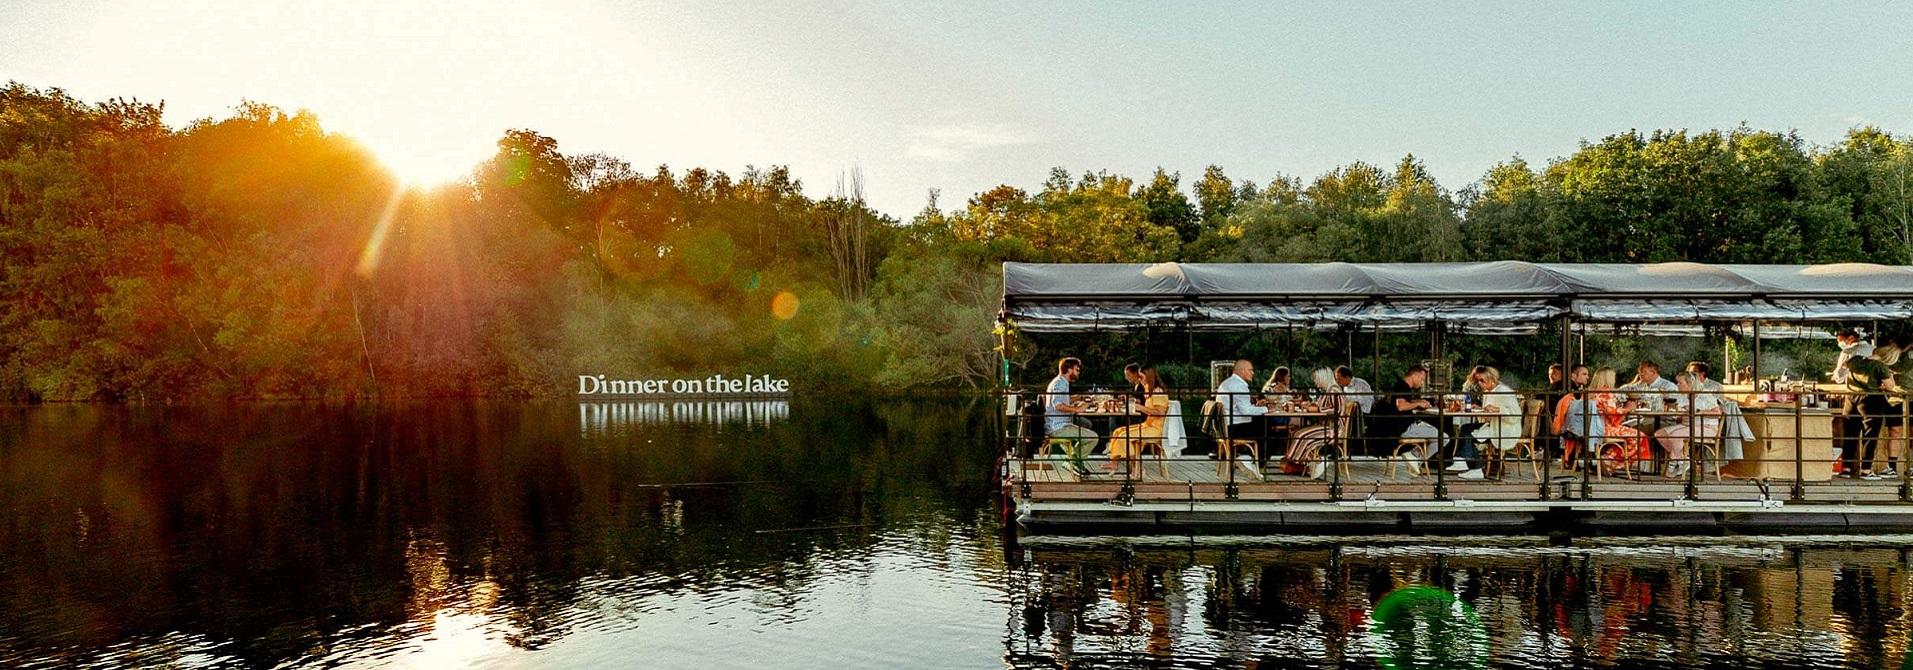 Dinner on the lake x Polderwind